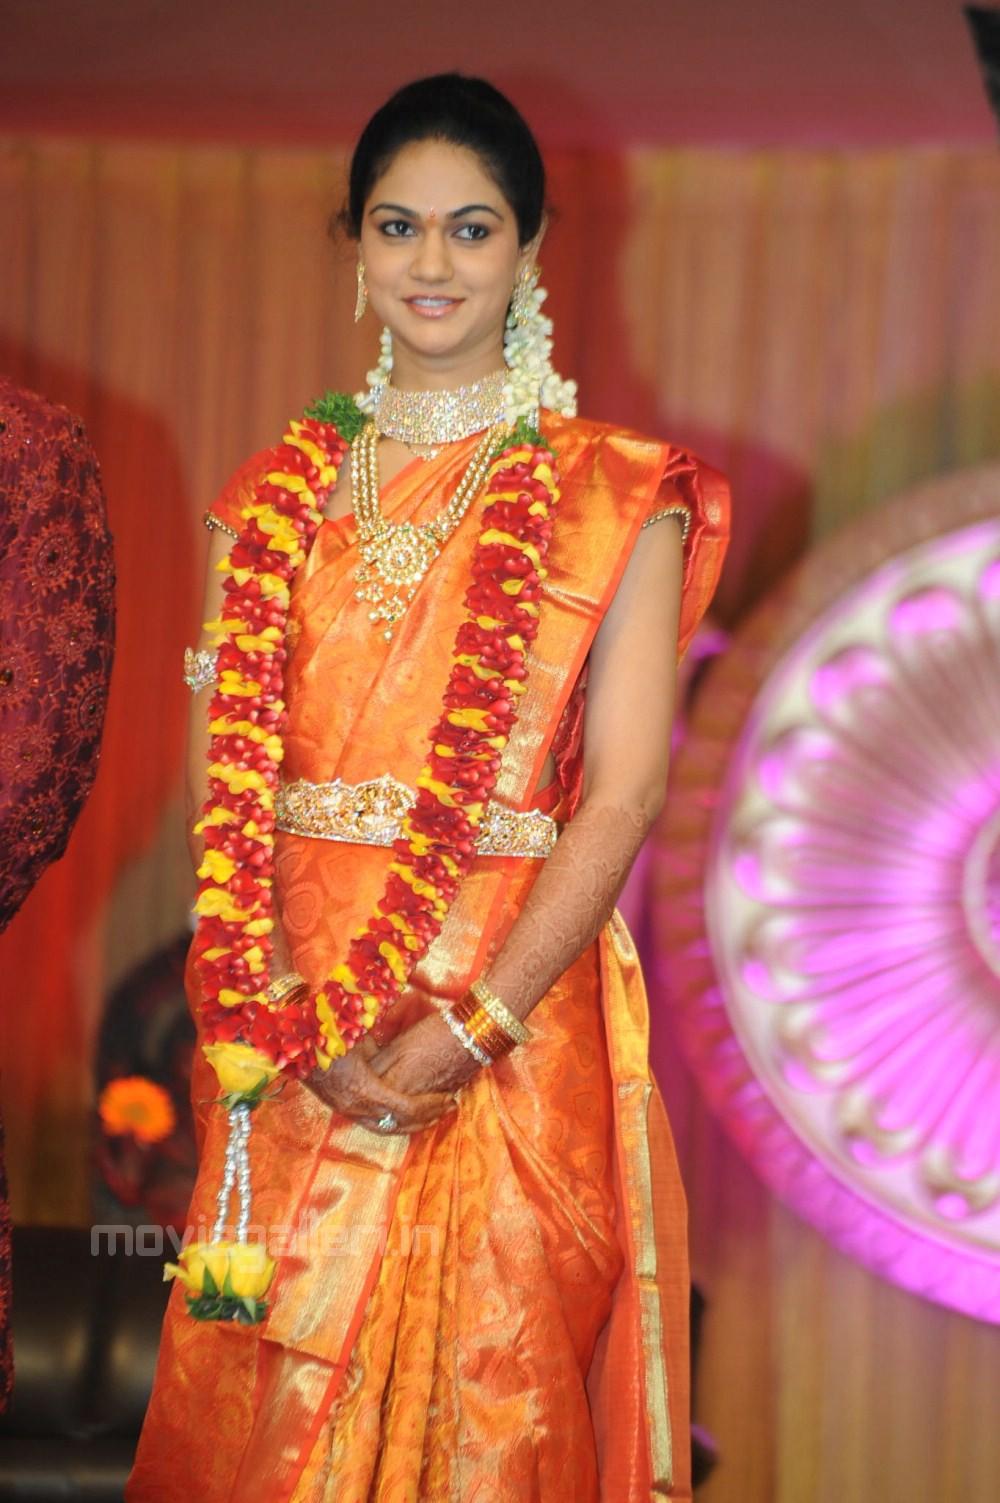 Bridal Wallpaper Hd Sneha Reddy Wedding Saree Stills In Allu Arjun Reception